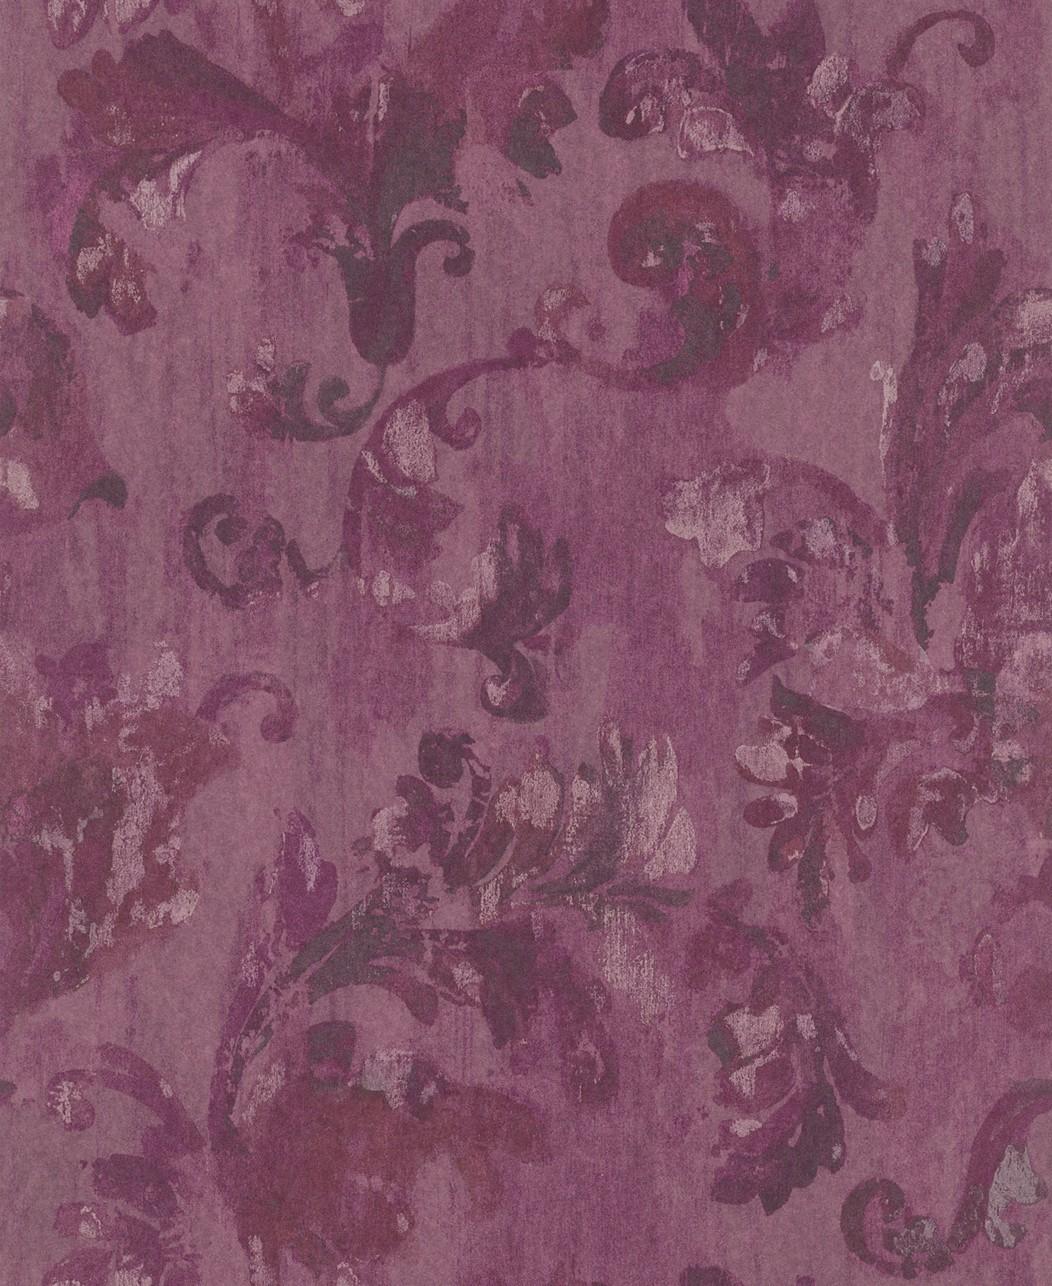 Tapete rasch textil tintura blumen lila grau 227030 for Muster tapete lila grau